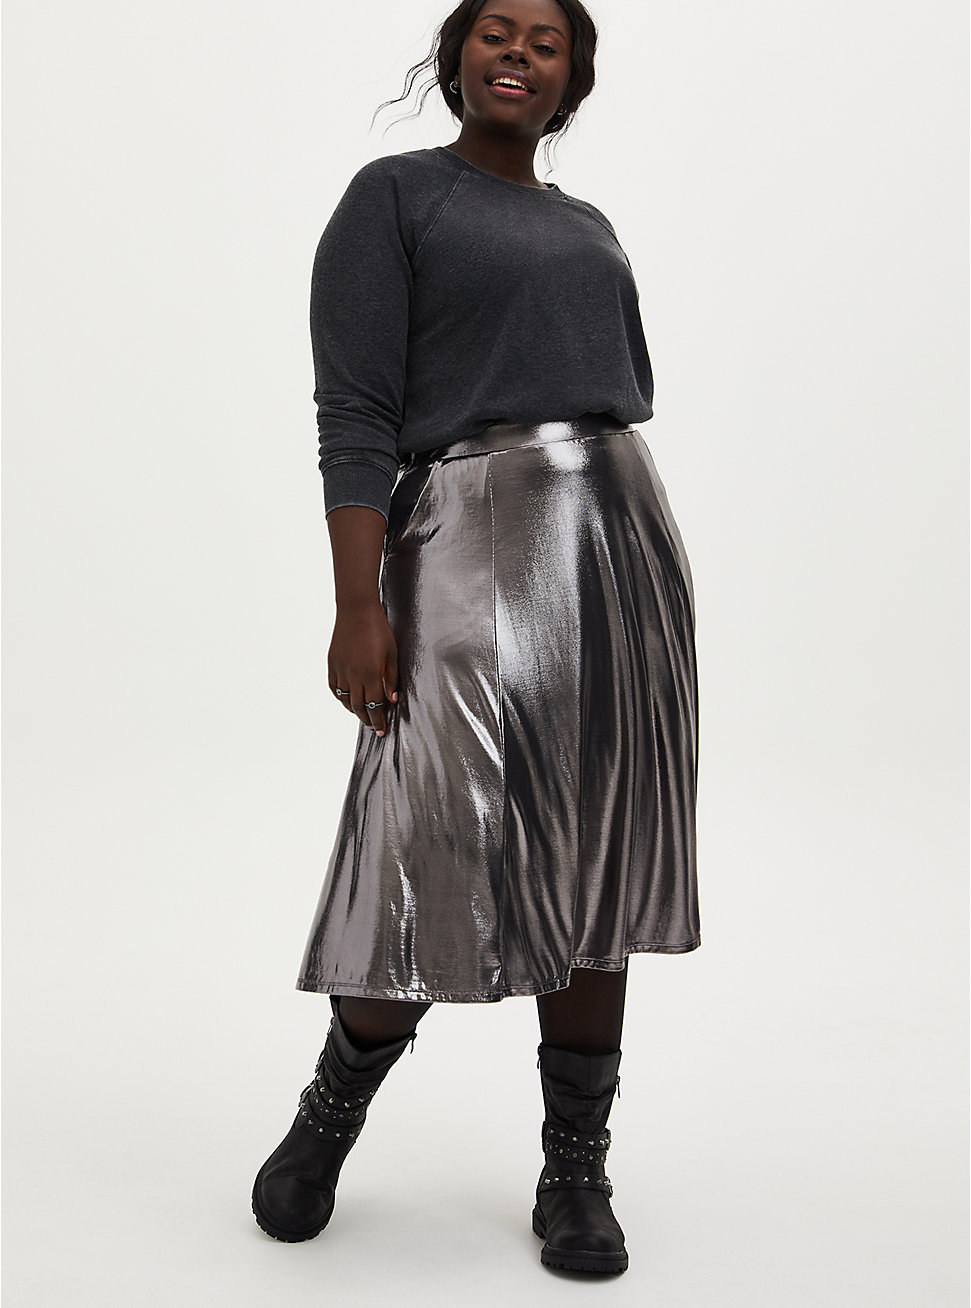 model wearing a silver metallic midi skirt